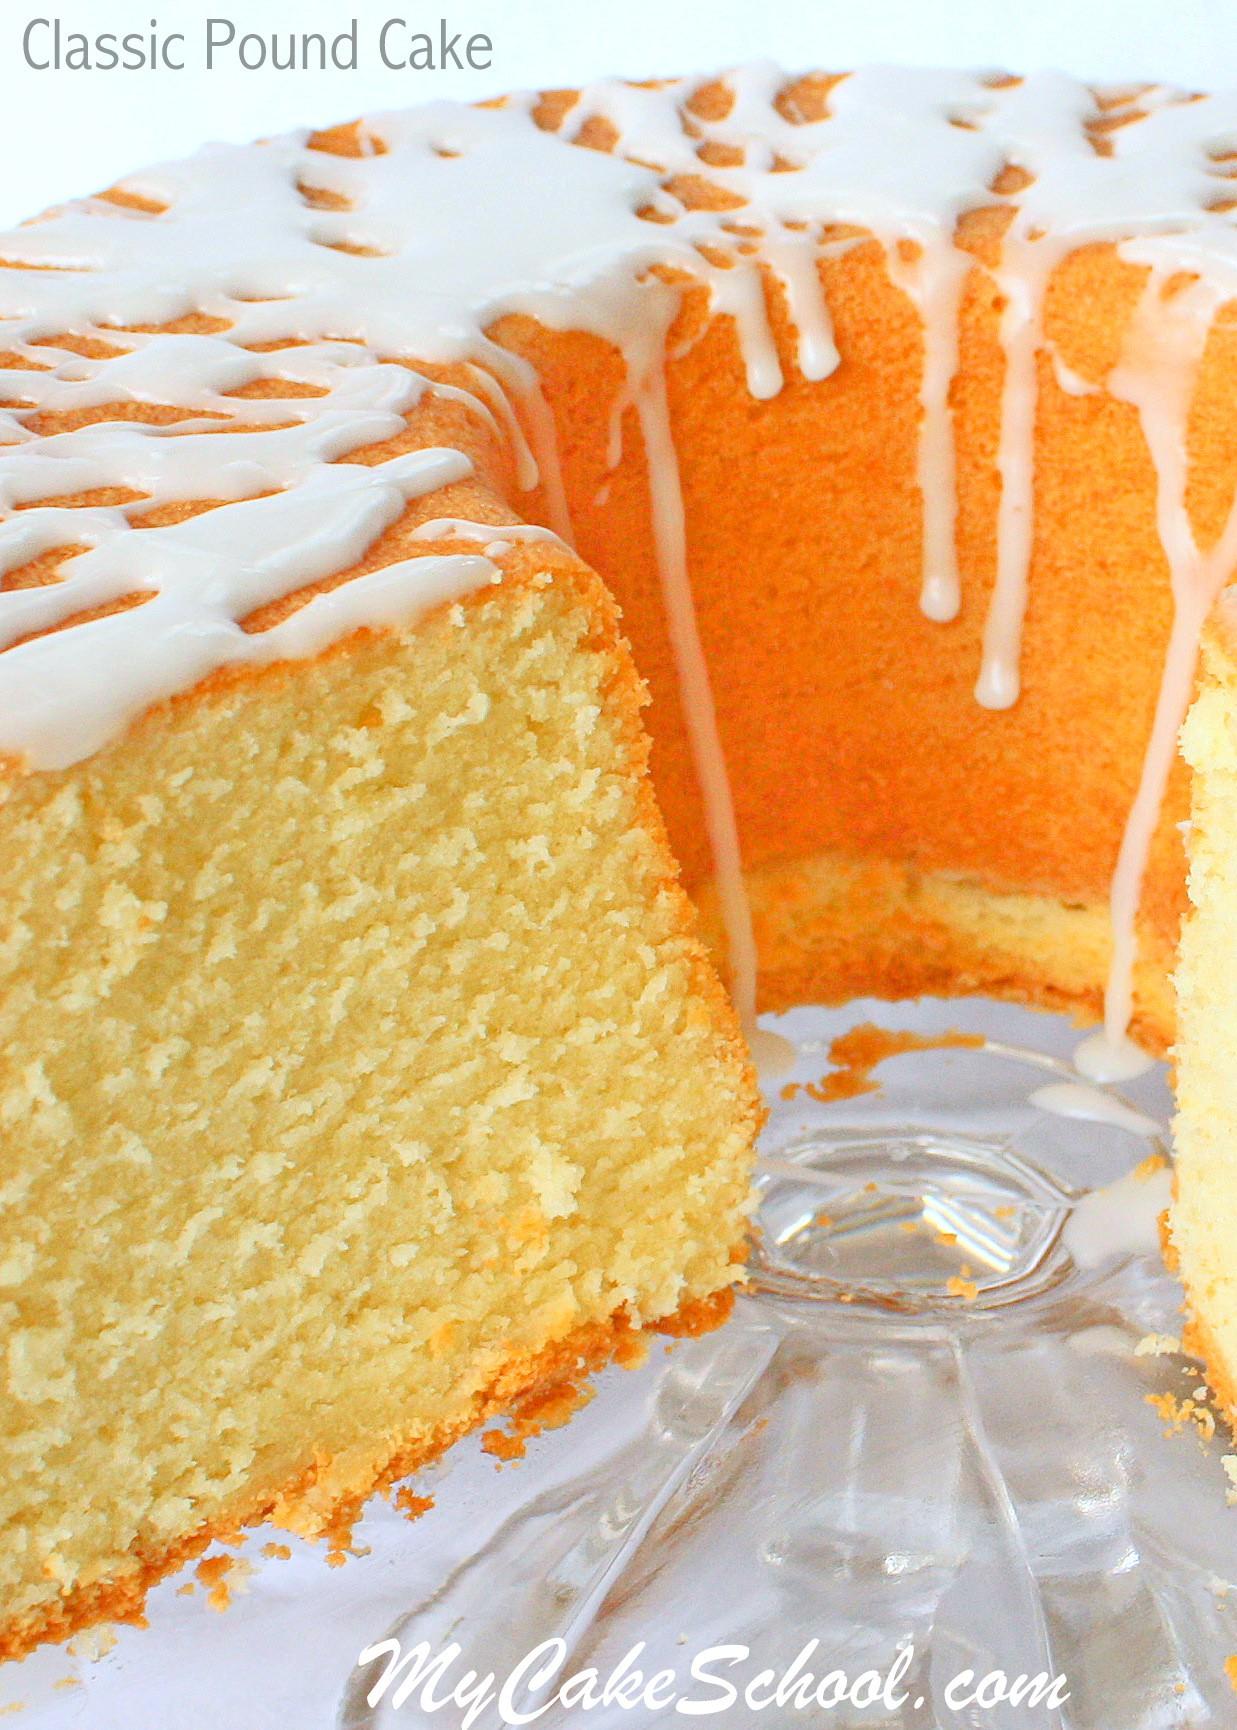 Classic Pound Cake Recipe by My Cake School